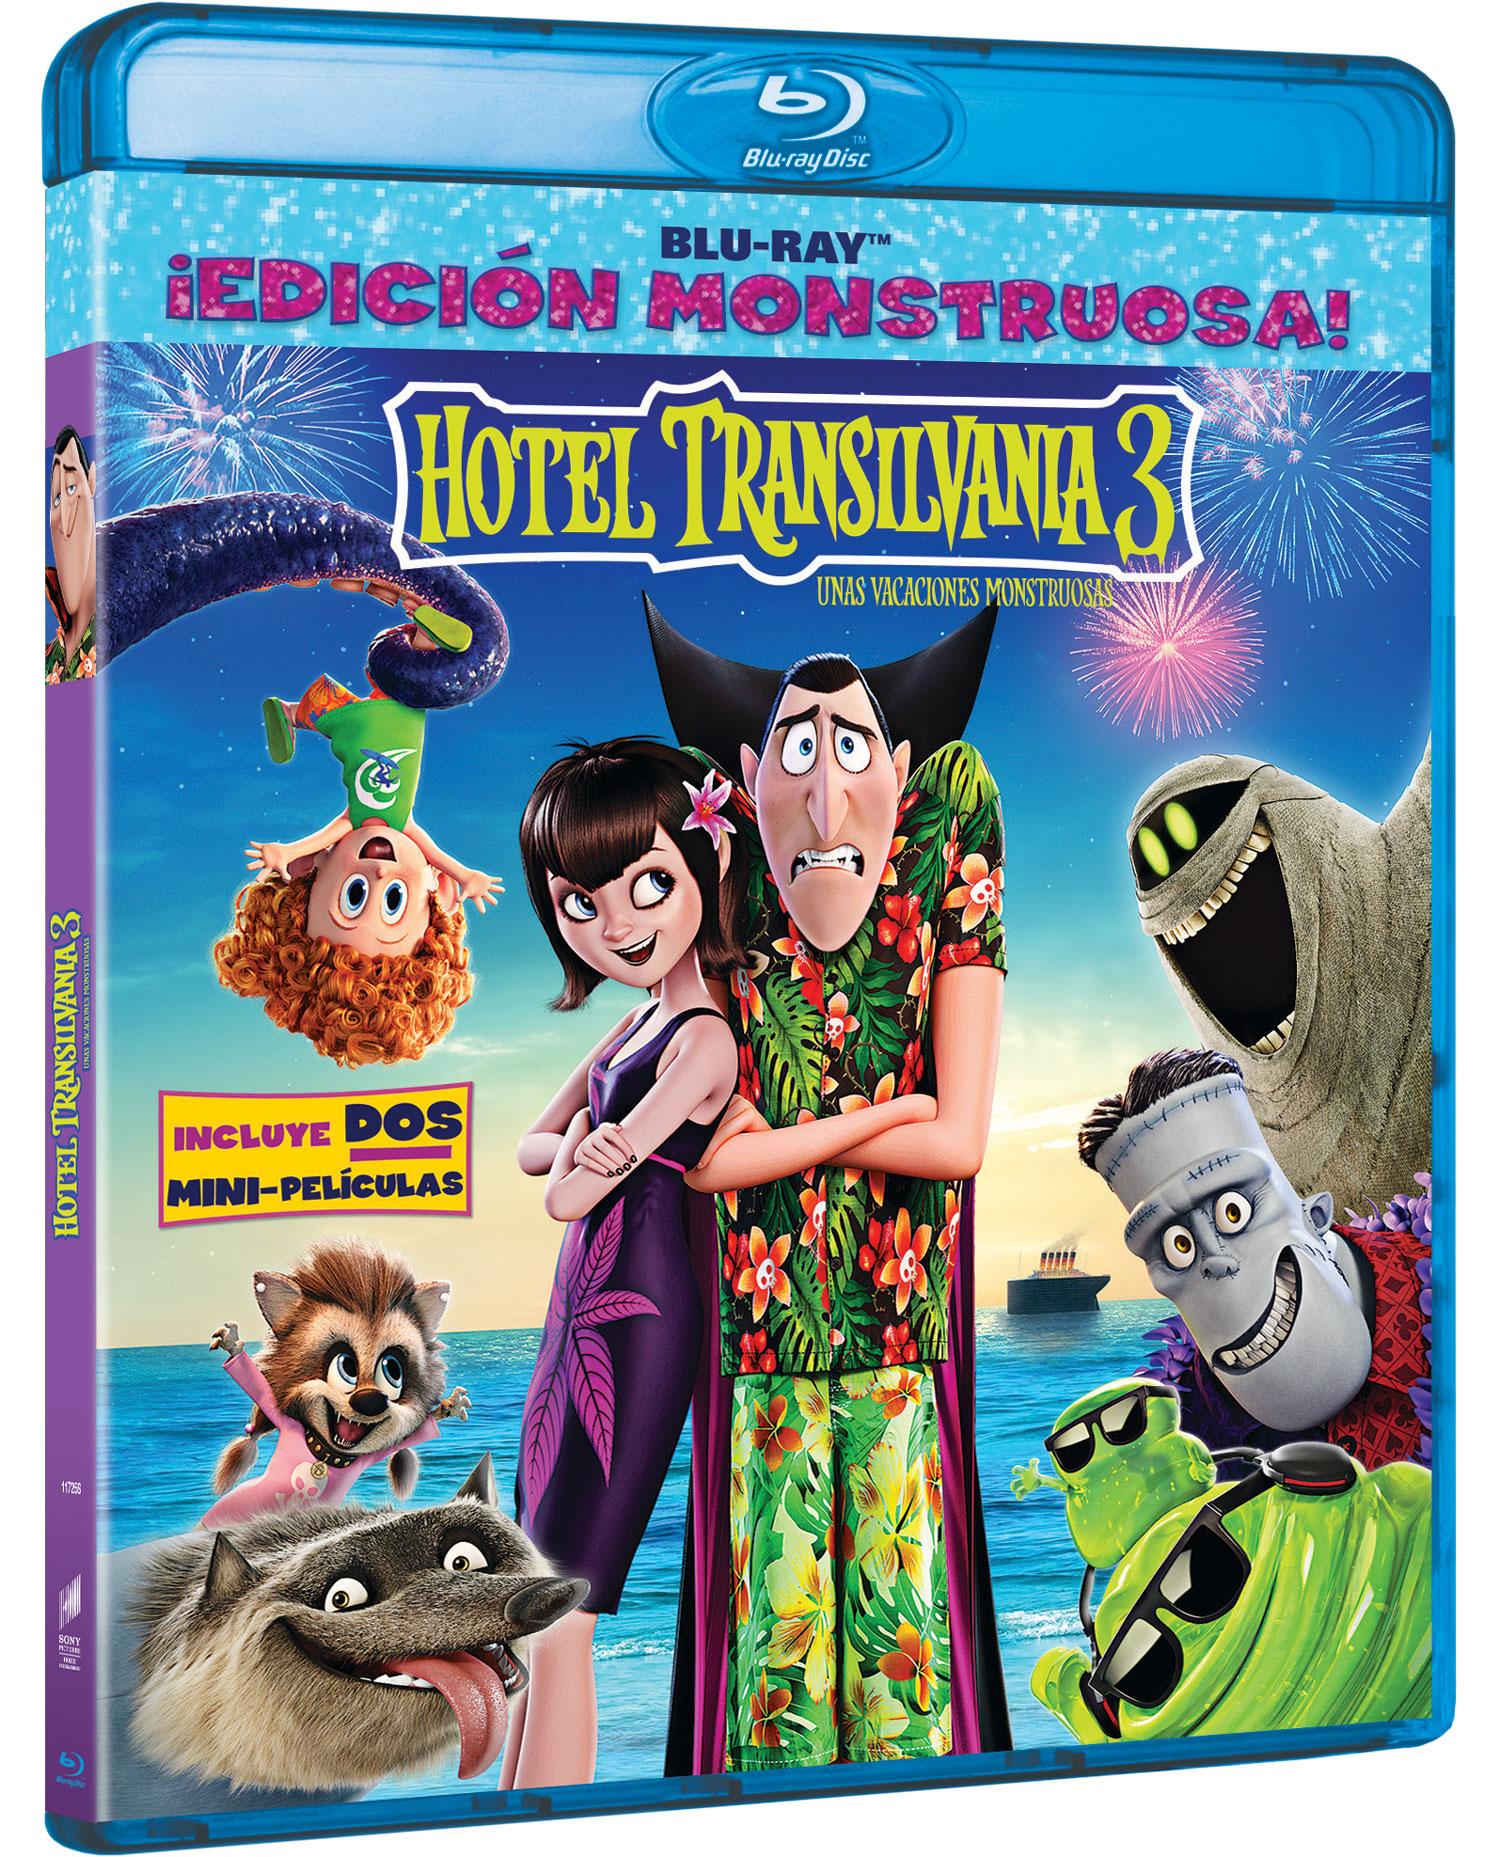 'Hotel Transilvania 3' Blu-ray